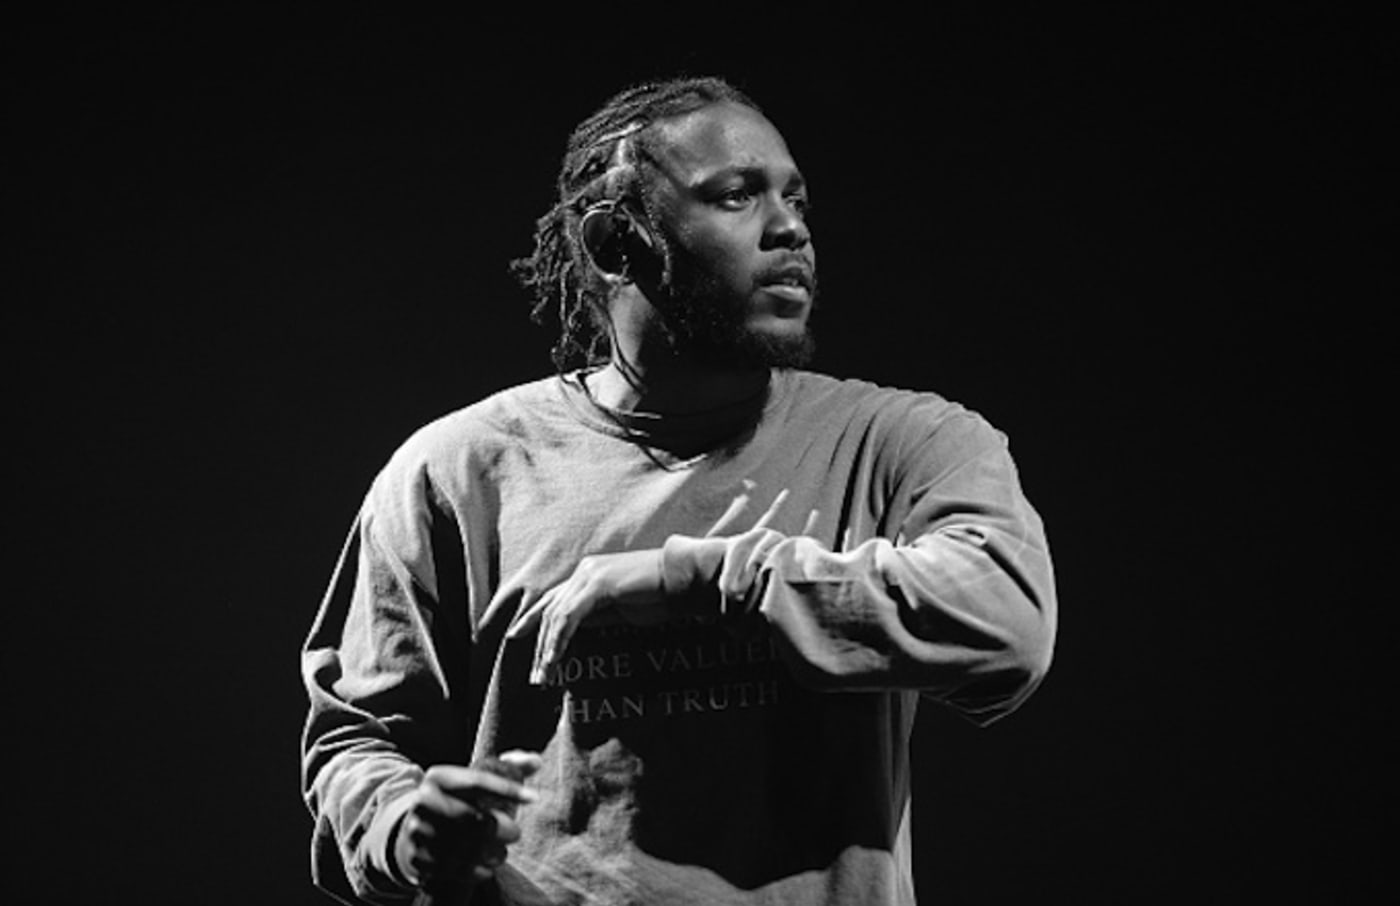 Kendrick Lamar performs onstage during FYF Festival